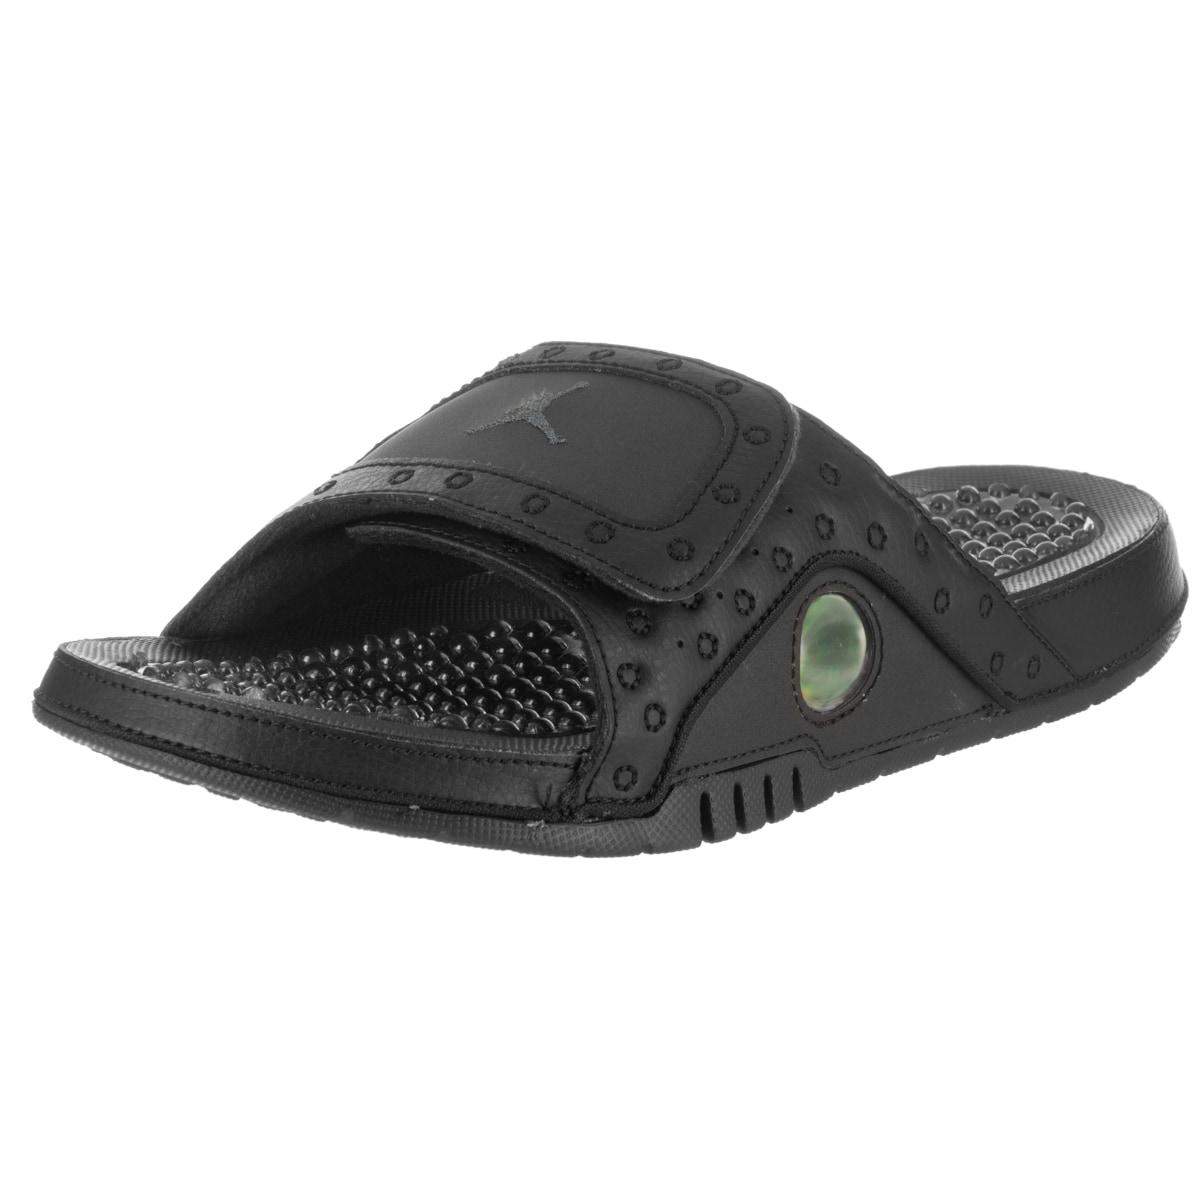 2cbc90d27f12 Nike Jordan Men s Jordan Hydro XIII Black Synthetic-leather Retro Sandals